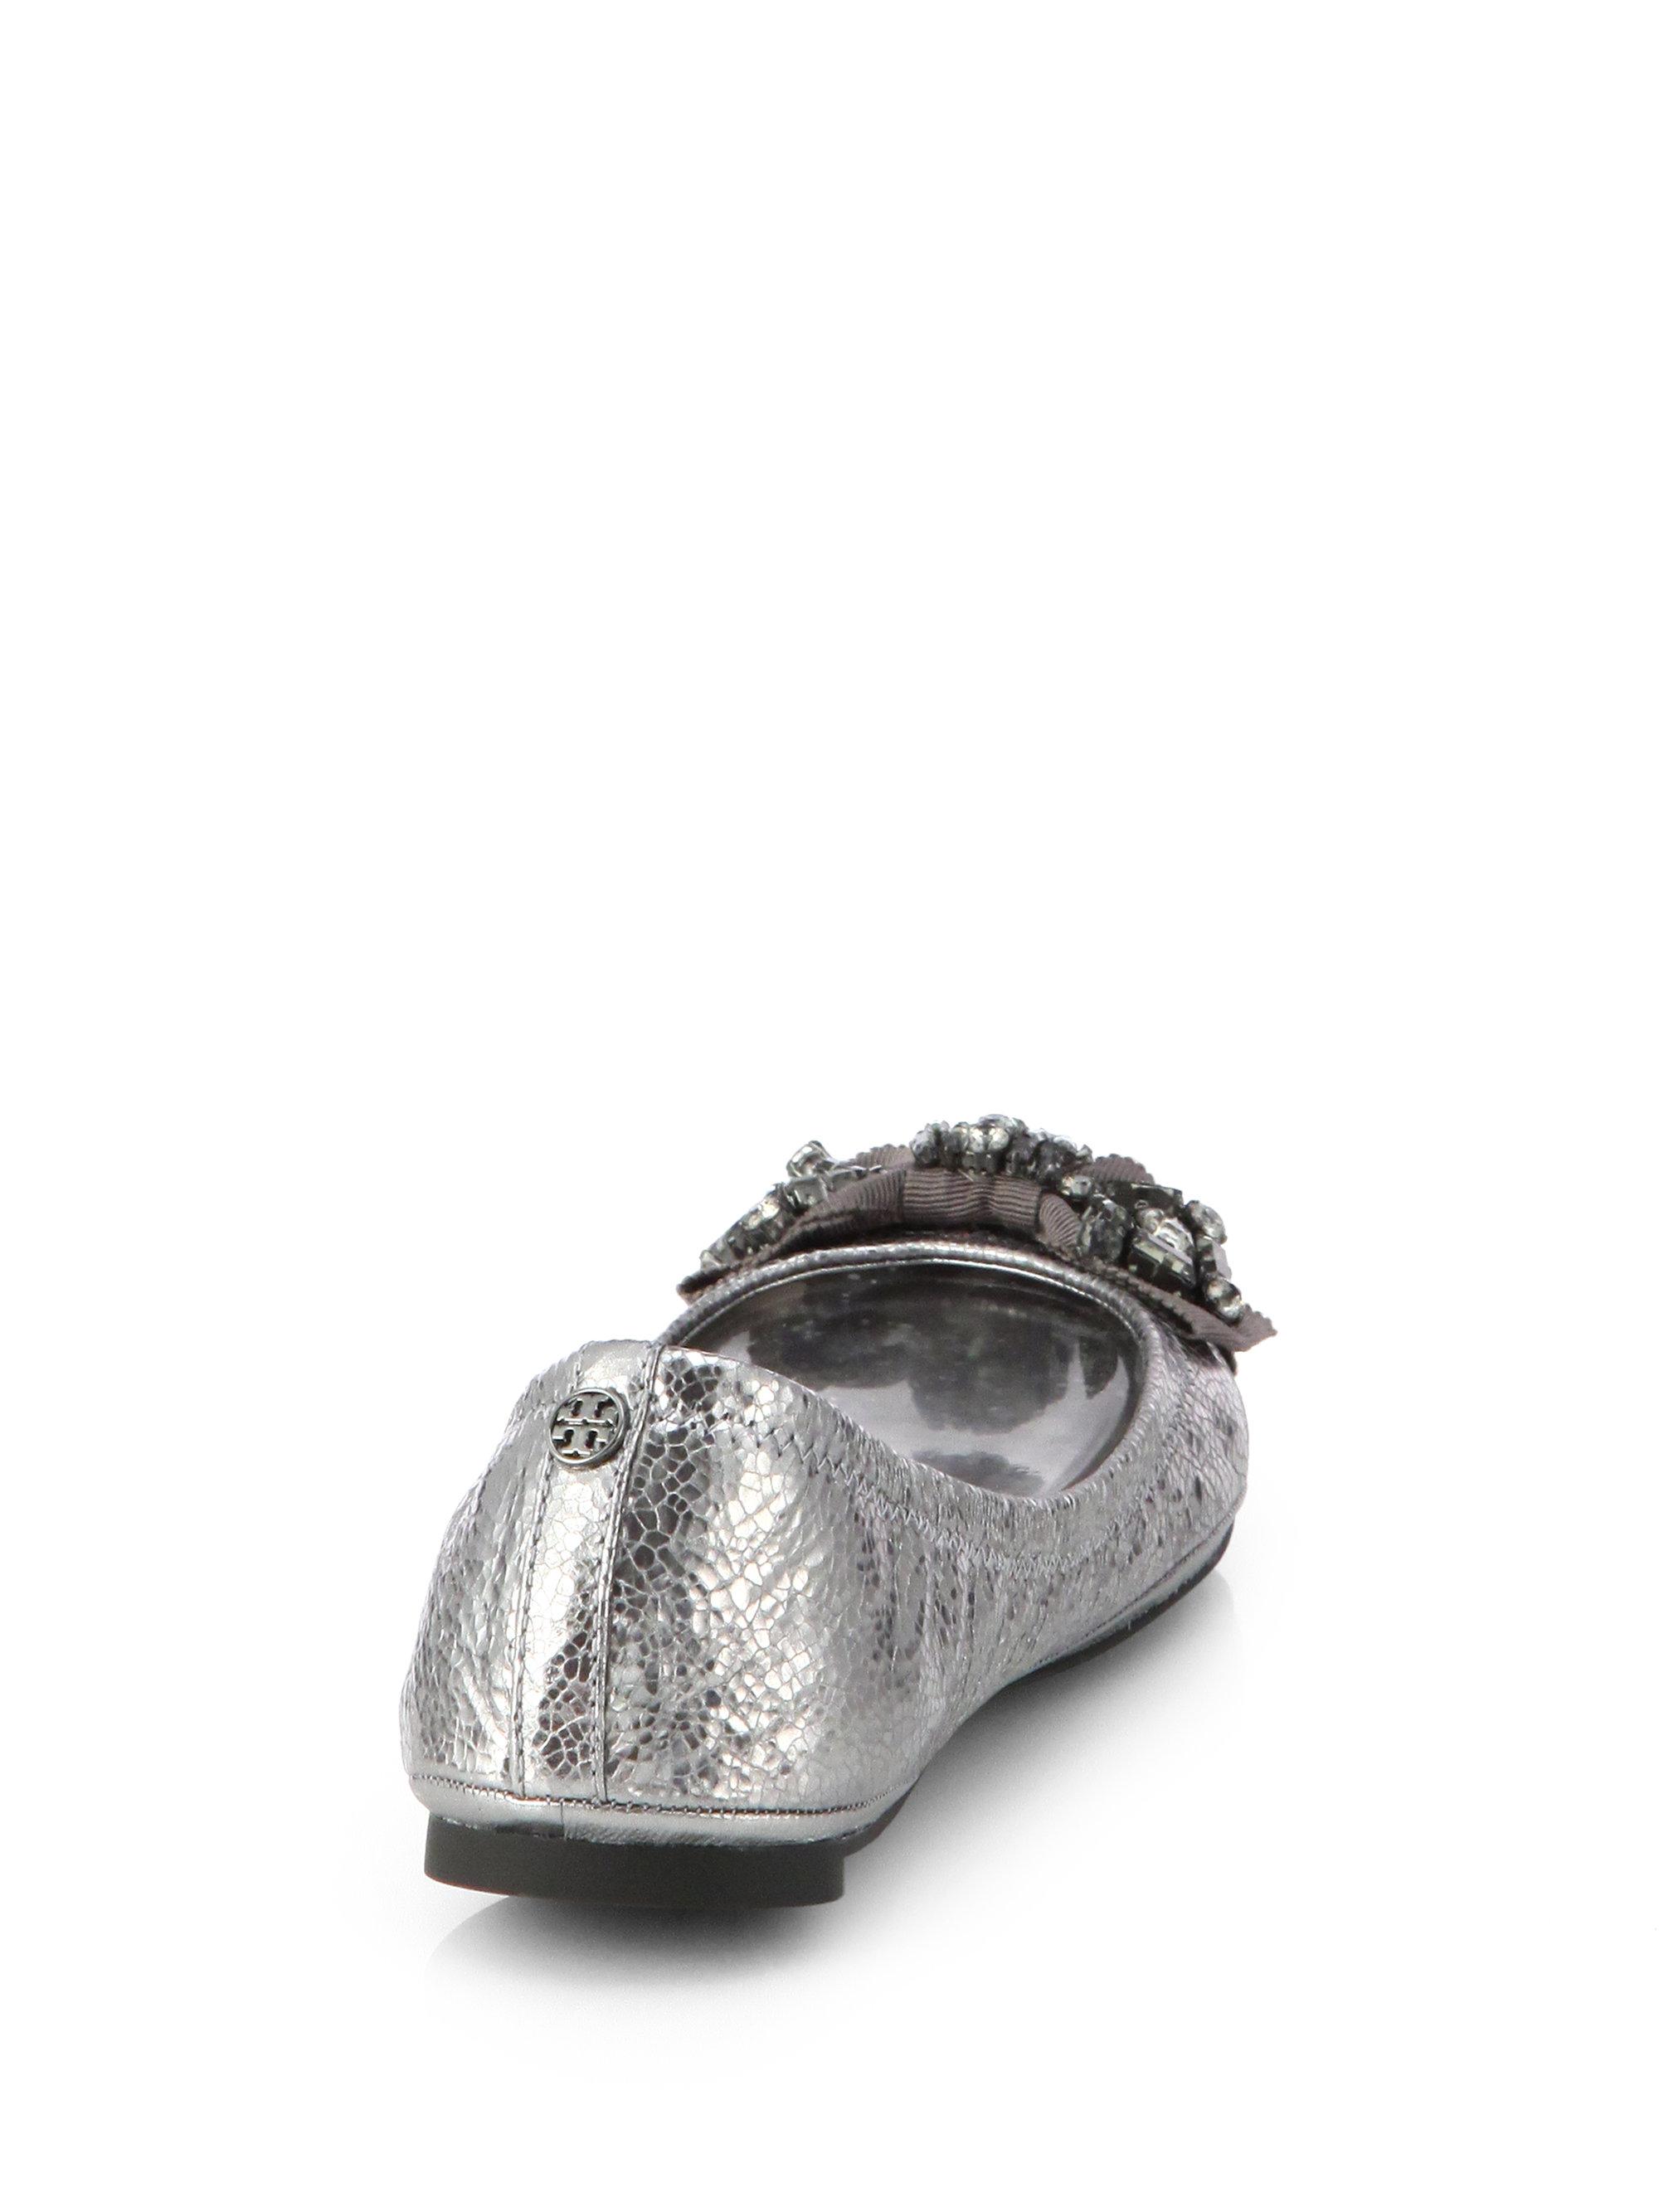 6786cd9e4bc Lyst - Tory Burch Azalea Jeweled Mirror Leather Ballet Flats in Metallic